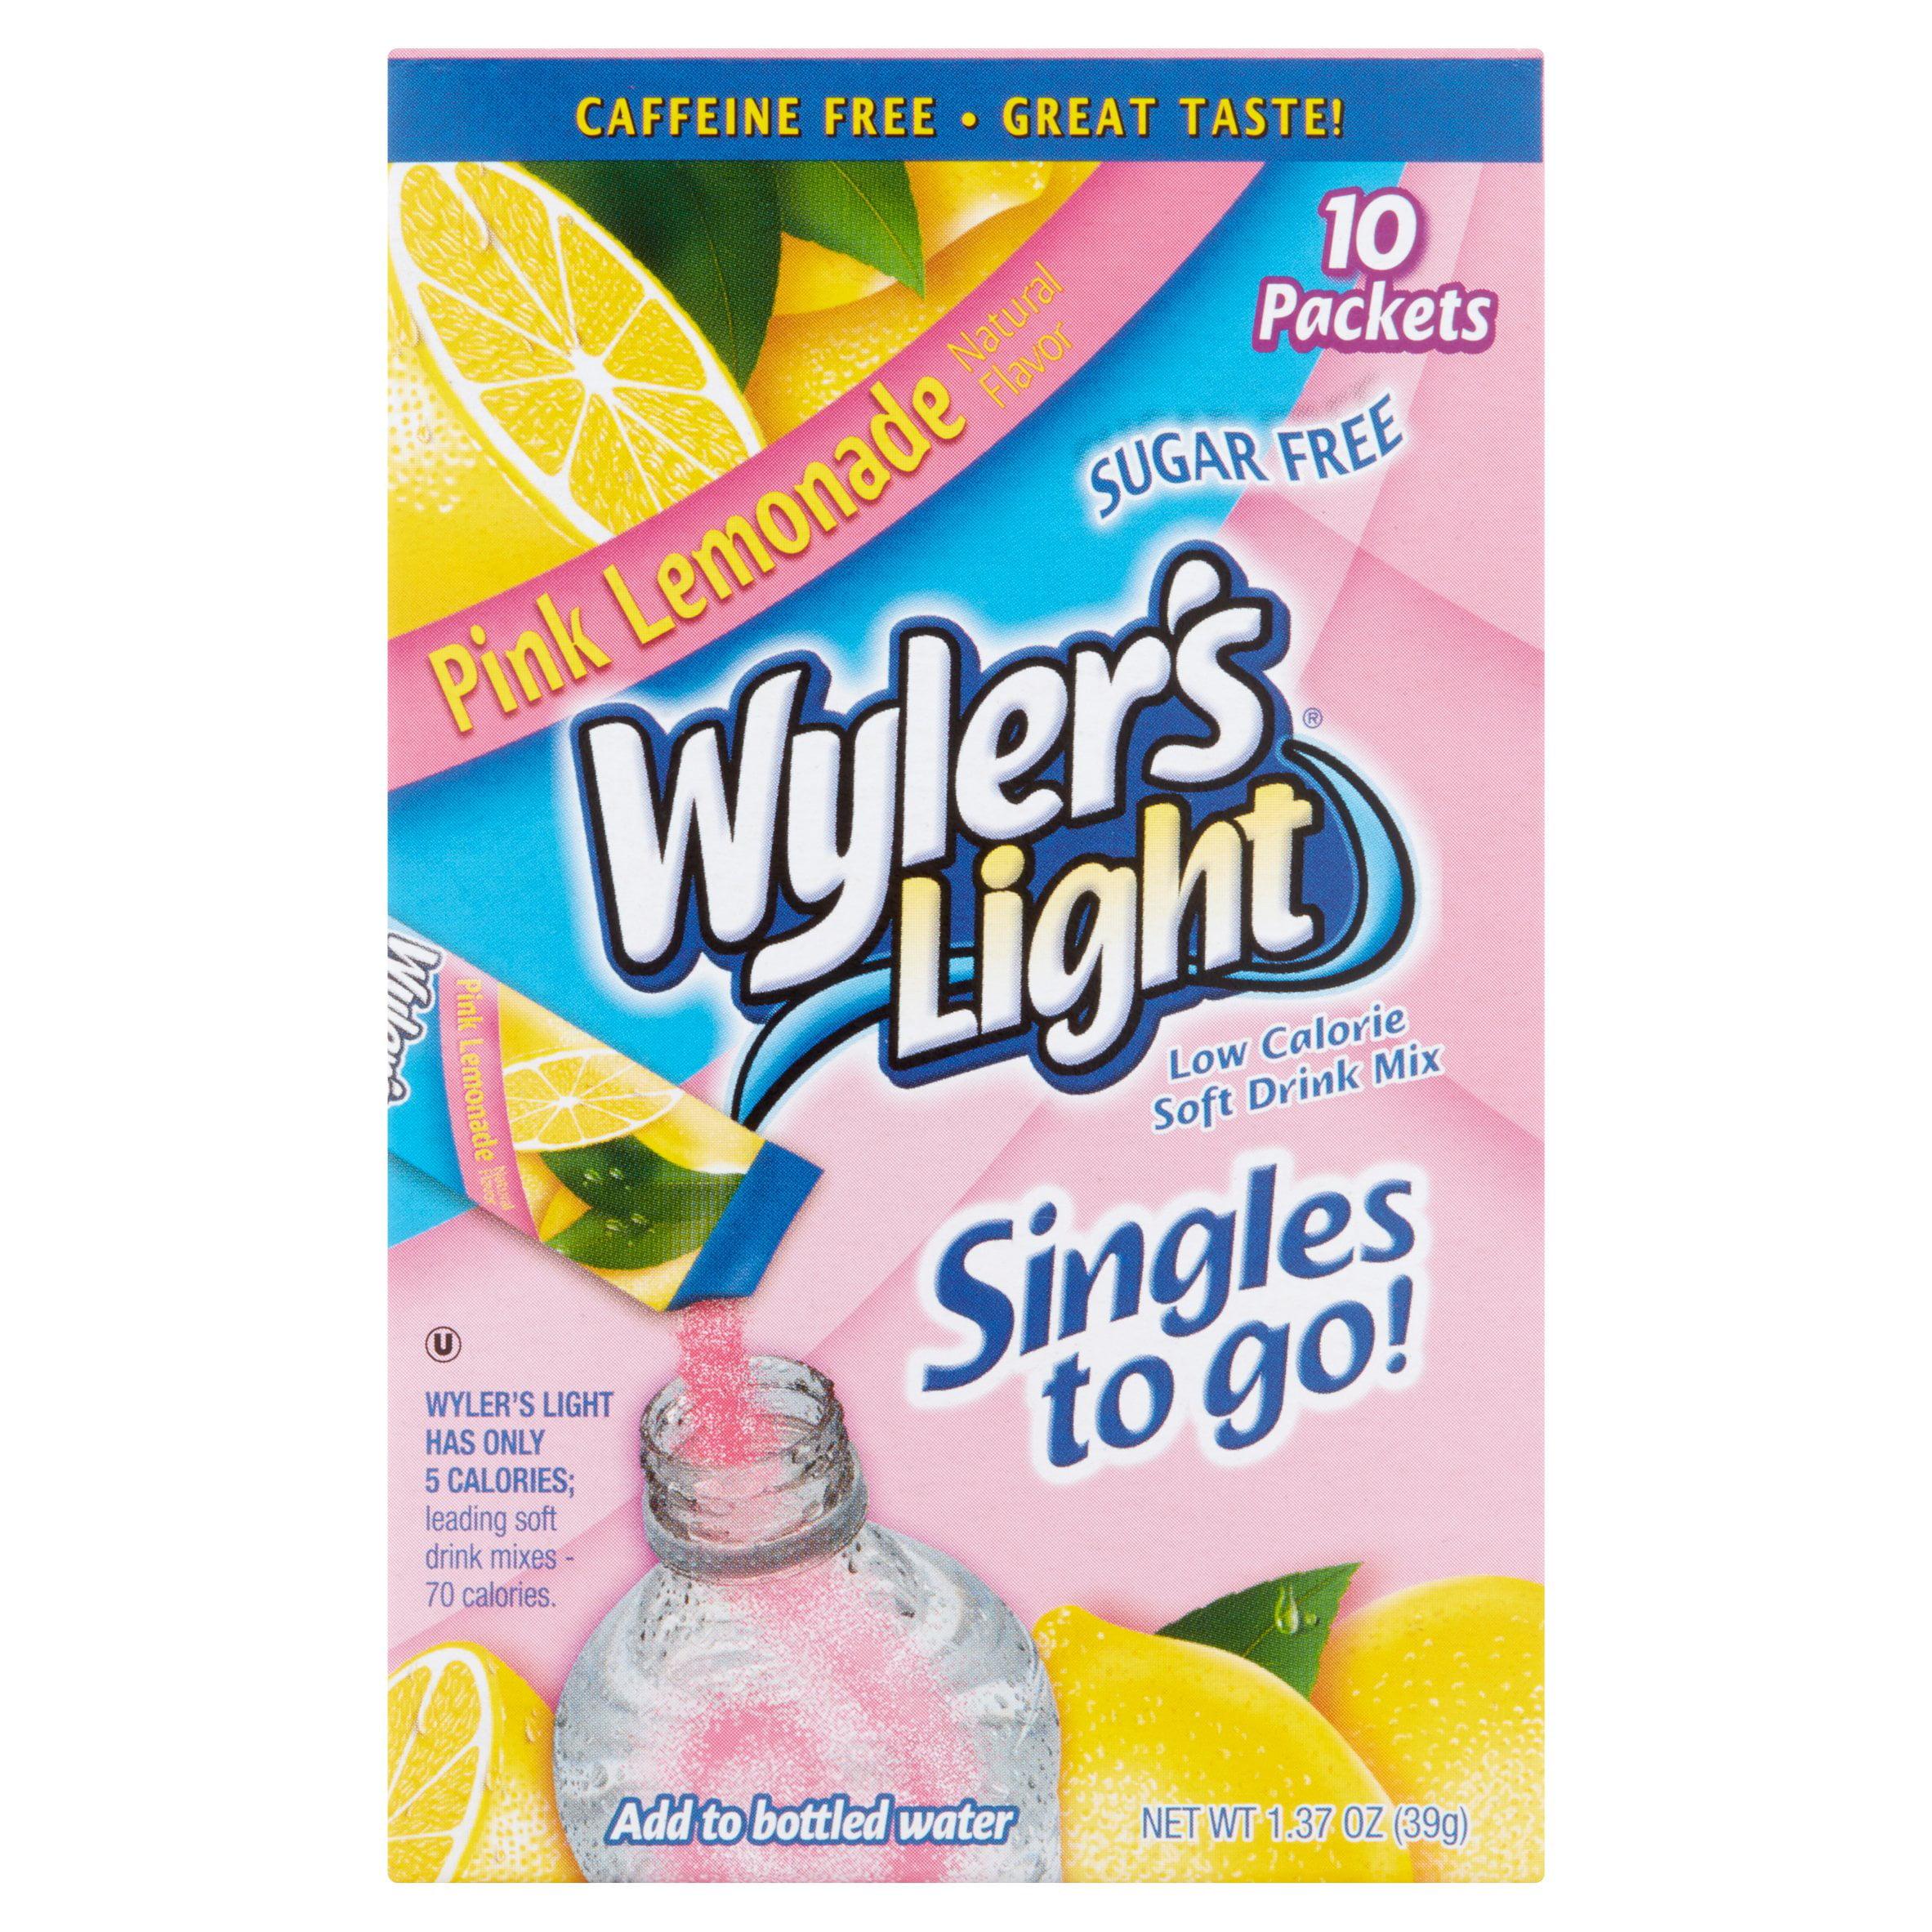 Wyler's Light Pink Lemonade Low Calorie Drink Mix, 10 count, 1.36 oz